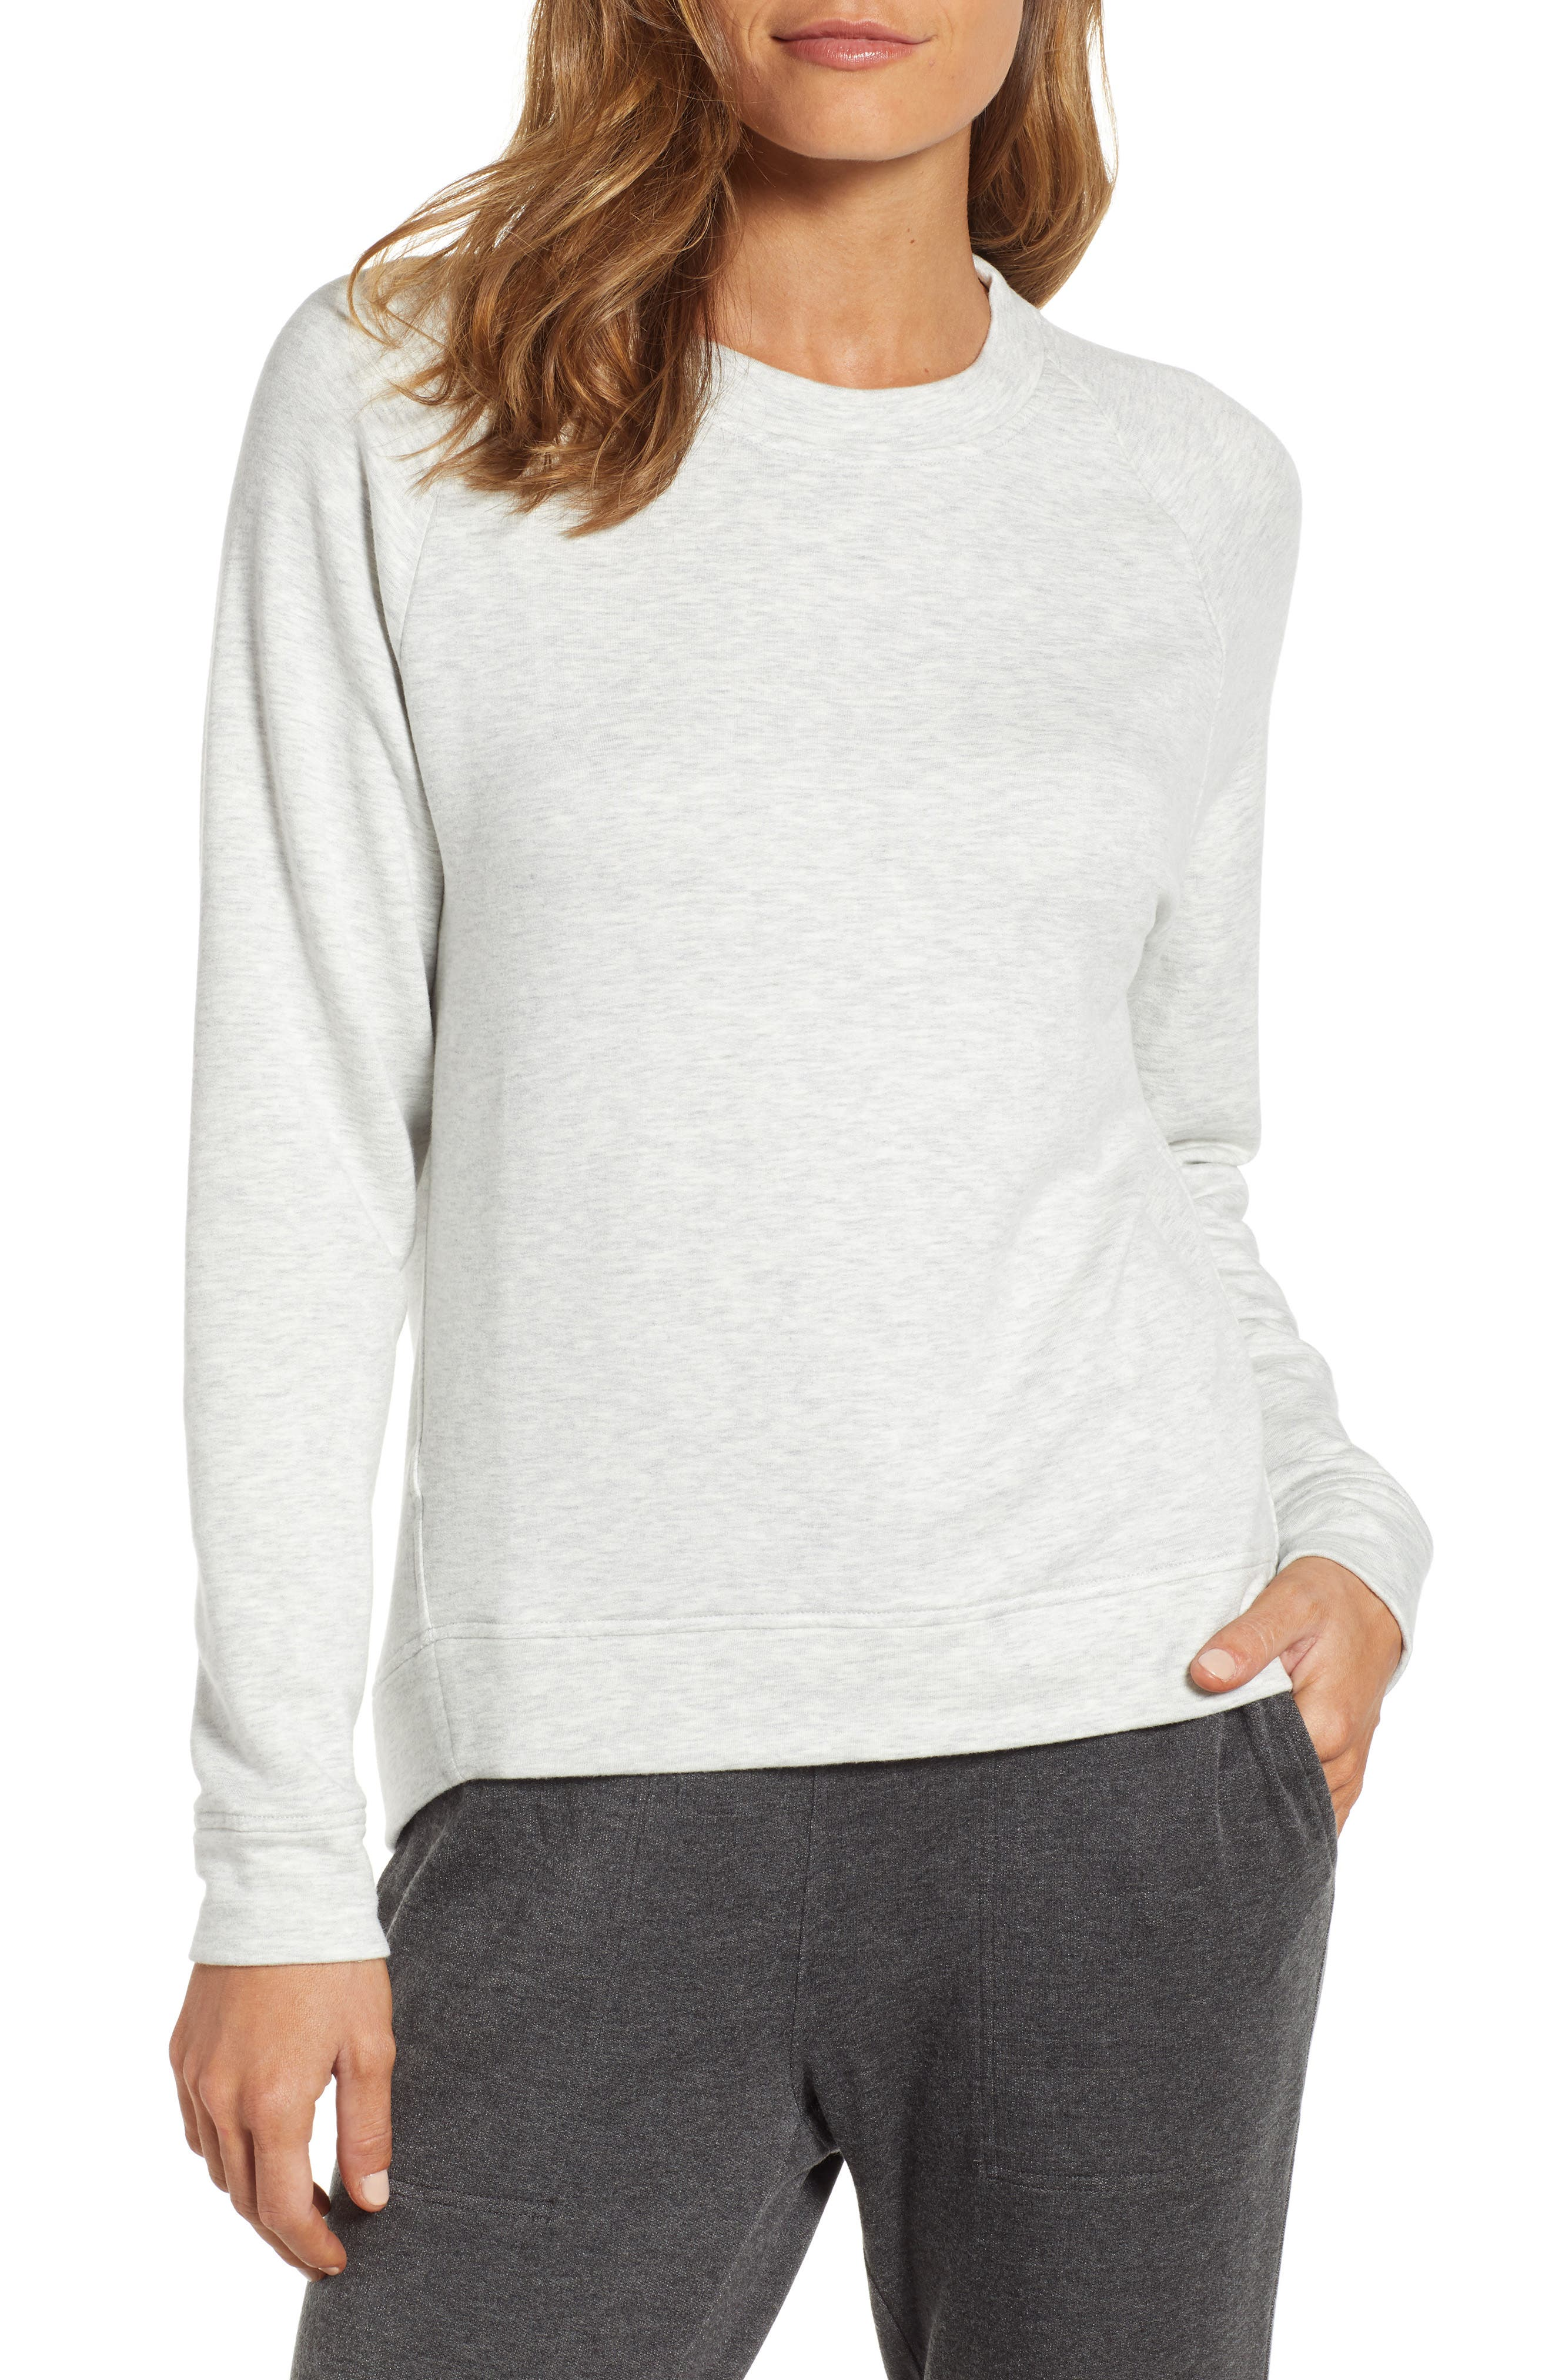 Lou & Grey Zen Bounce Sweatshirt, Grey